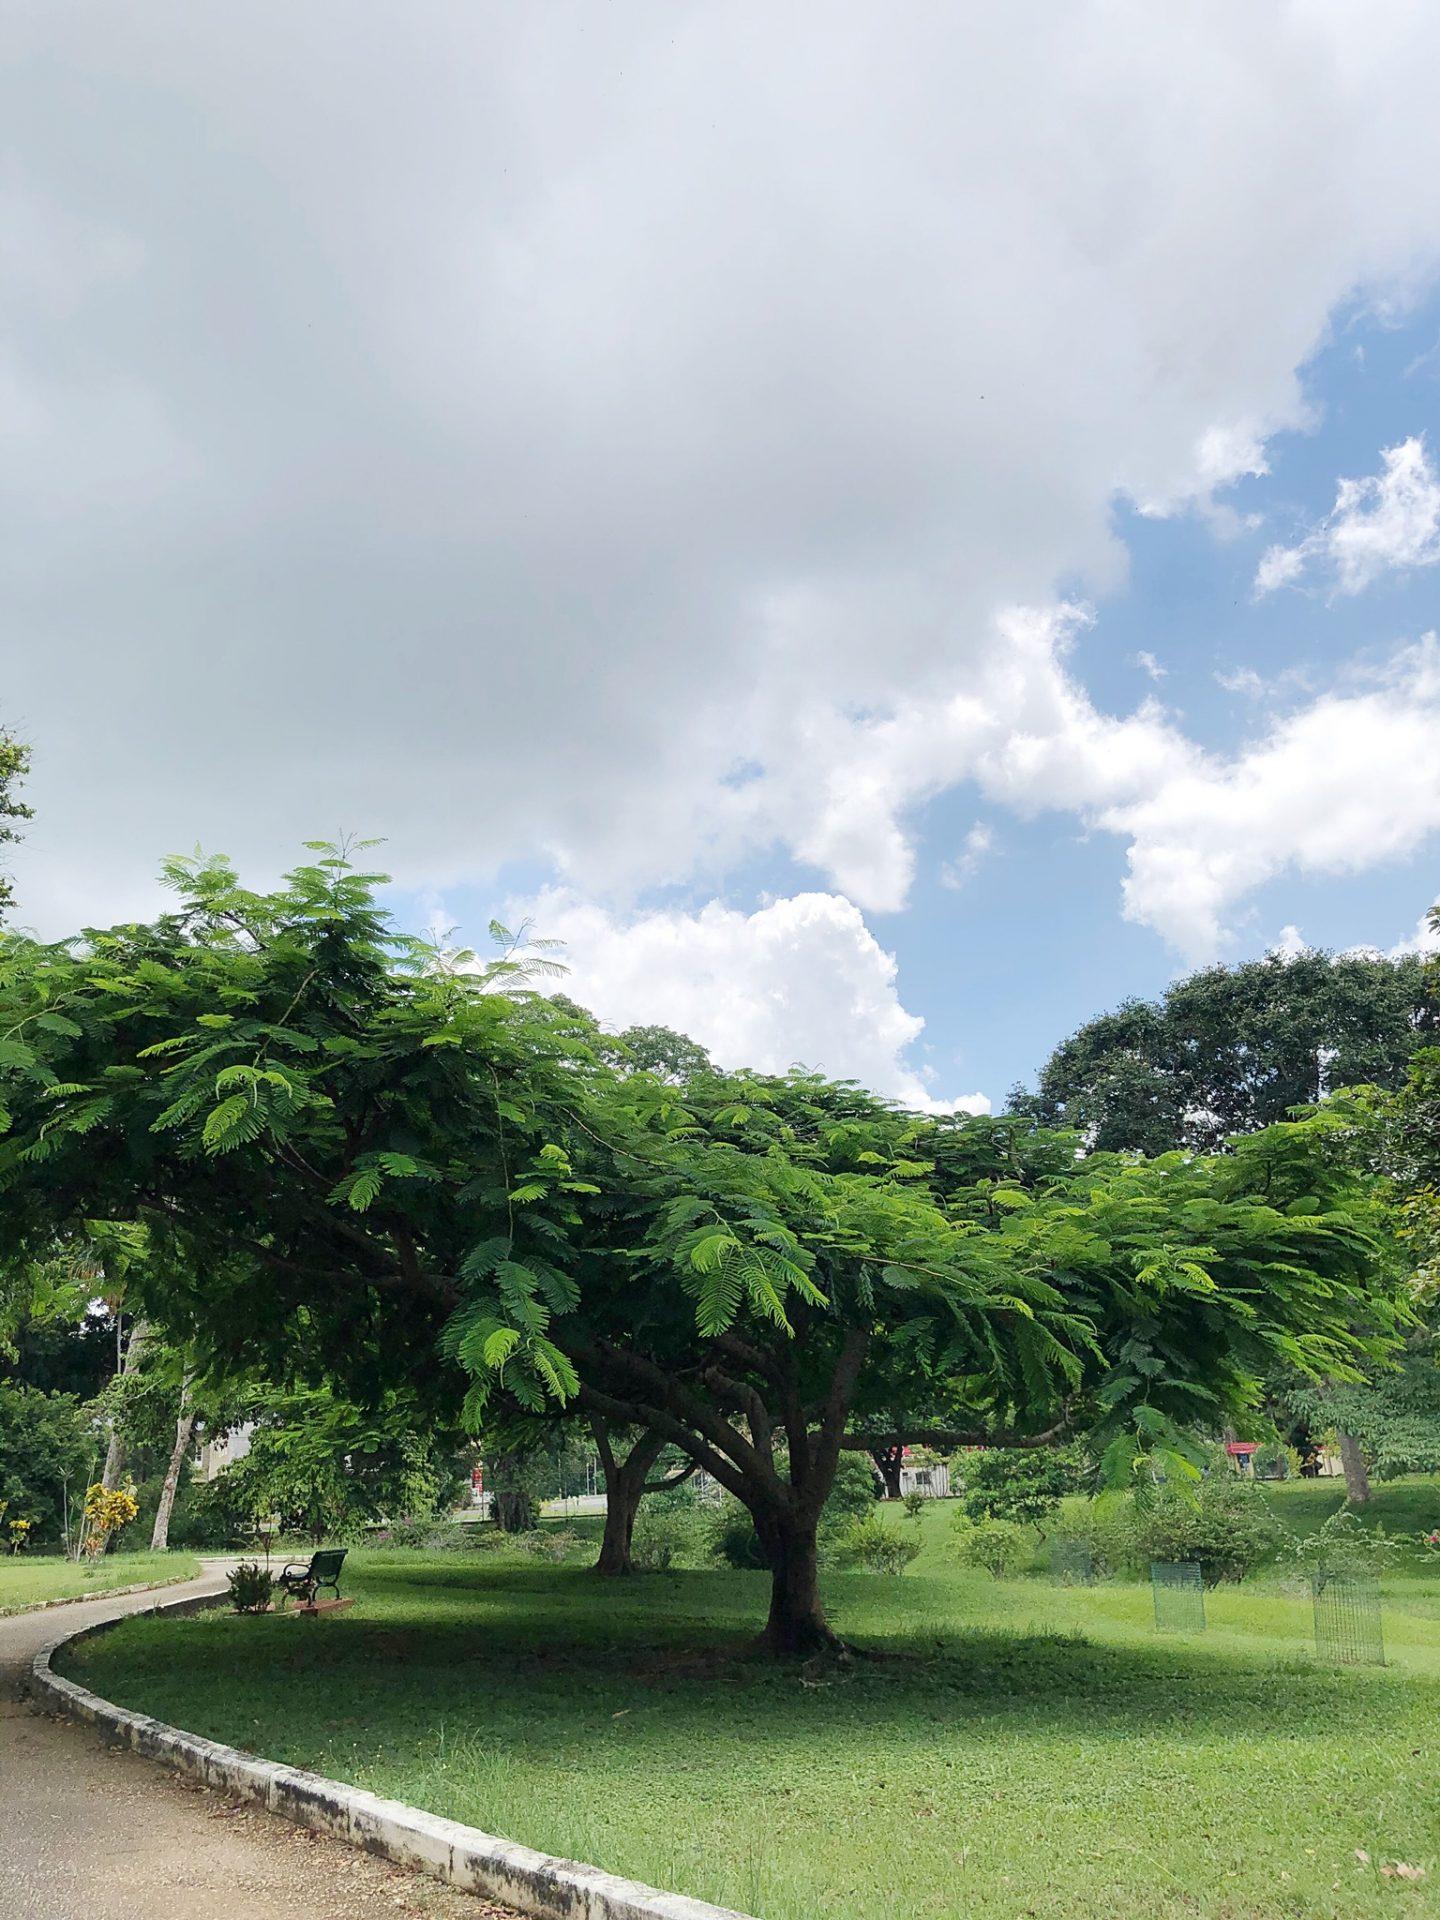 The Royal Botanic Gardens Trinidad